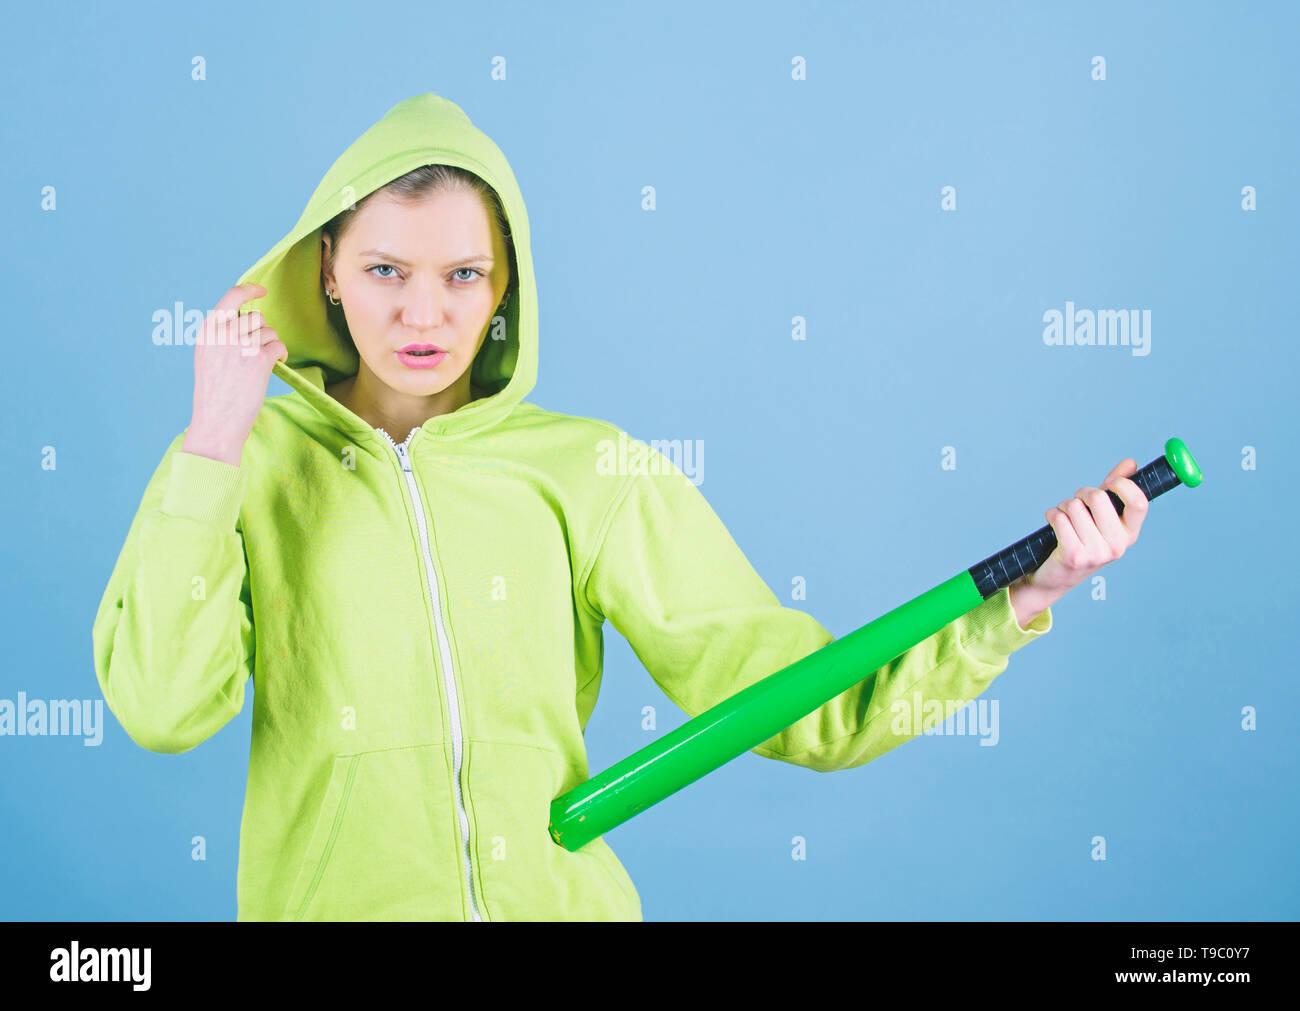 Feeling power. Woman play baseball game or going to beat someone. Girl hooded jacket hold baseball bat blue background. Woman in baseball sport. Baseball female player concept. She is dangerous. - Stock Image